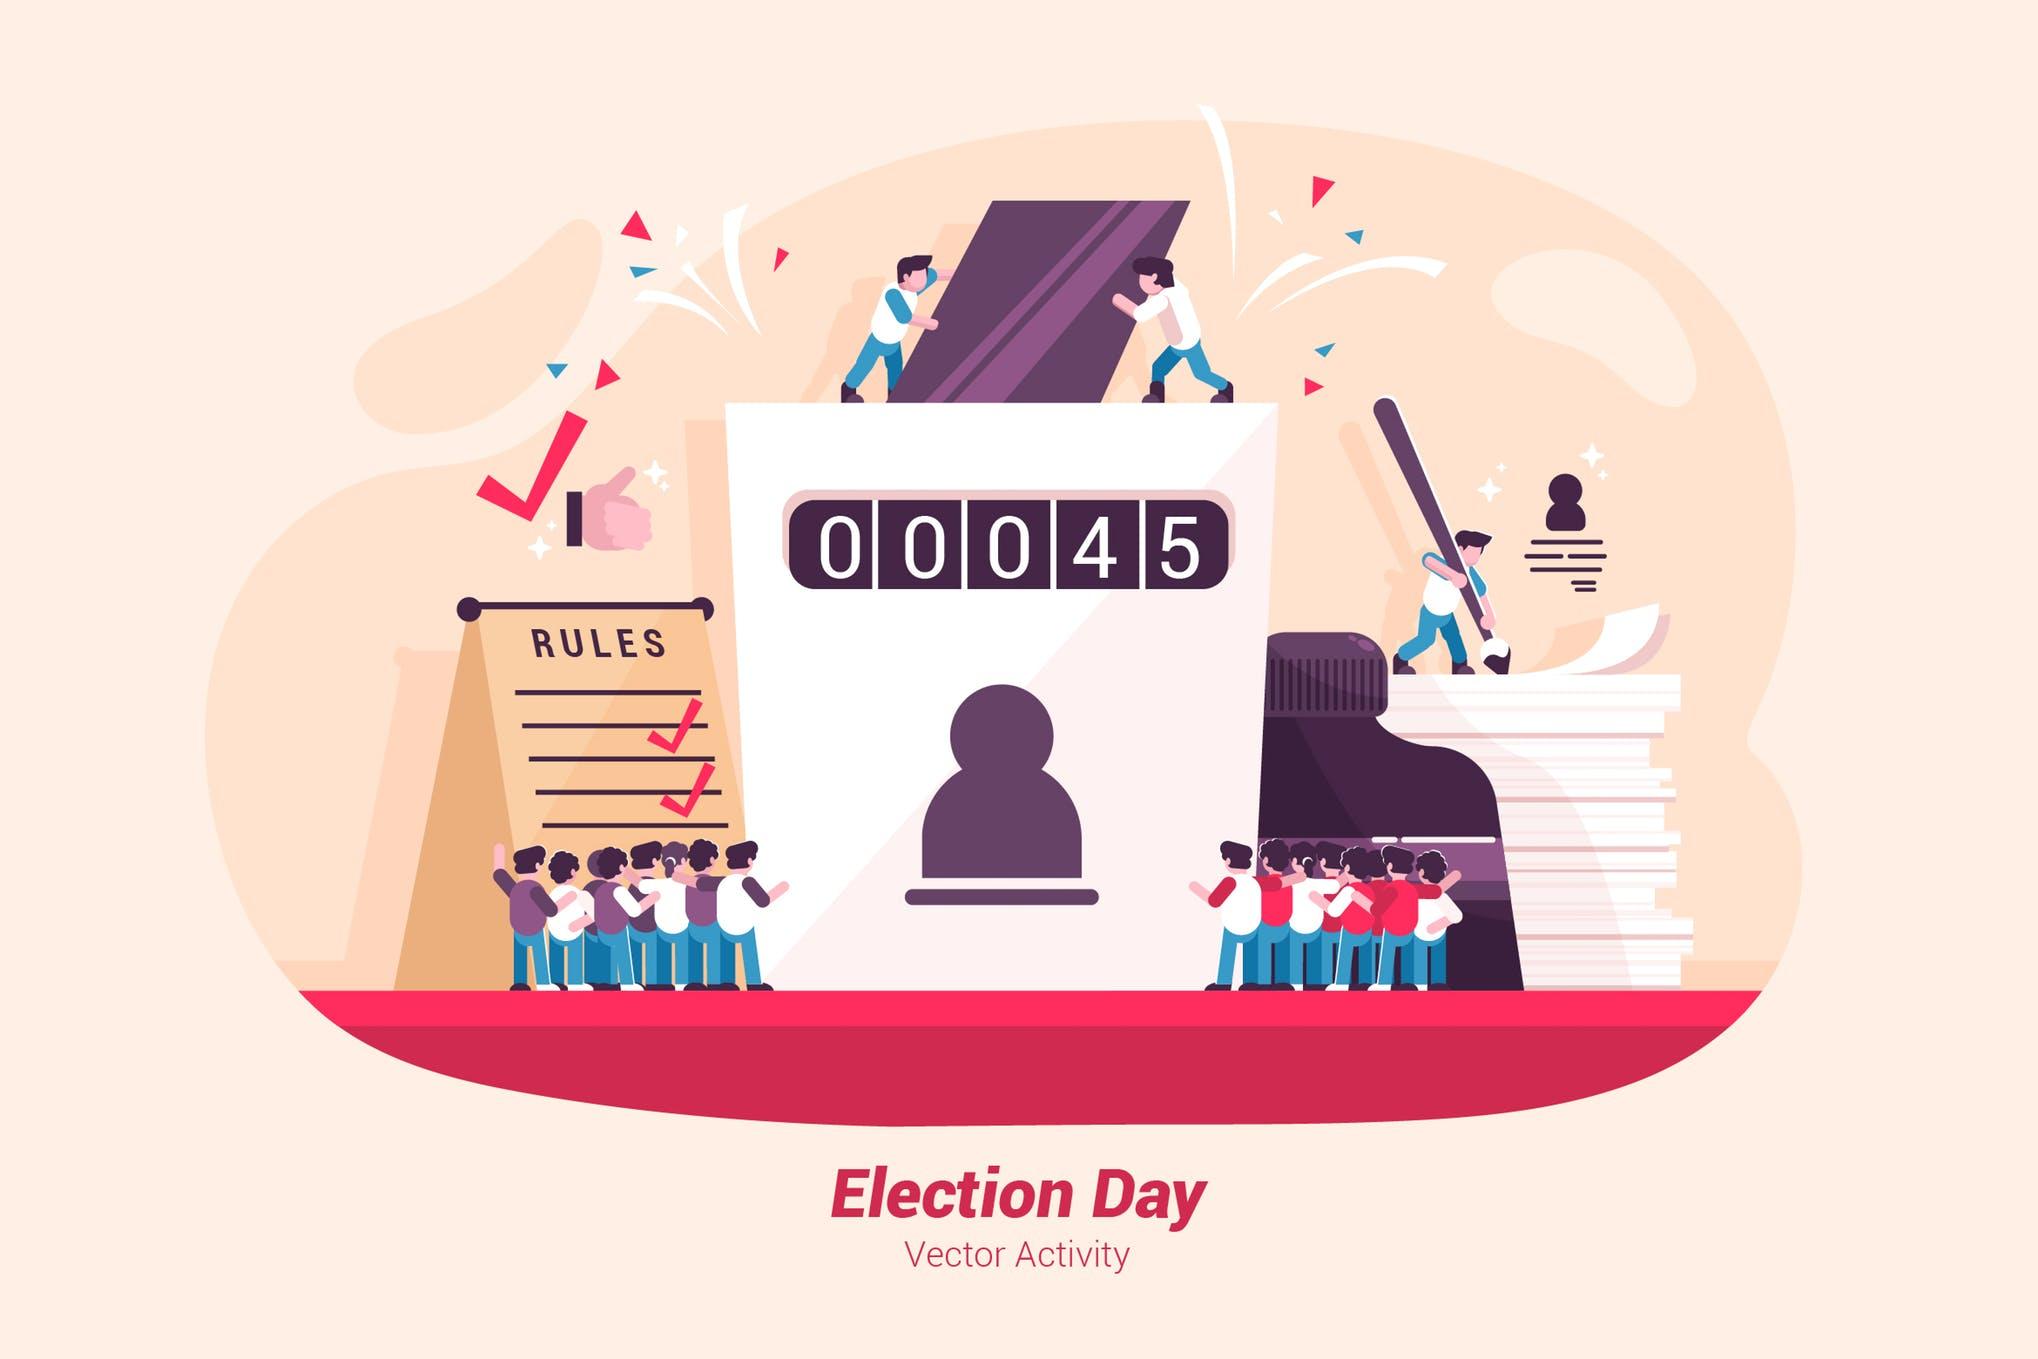 学习集会场景创意插画素材下载Election Day - Vector Illustration